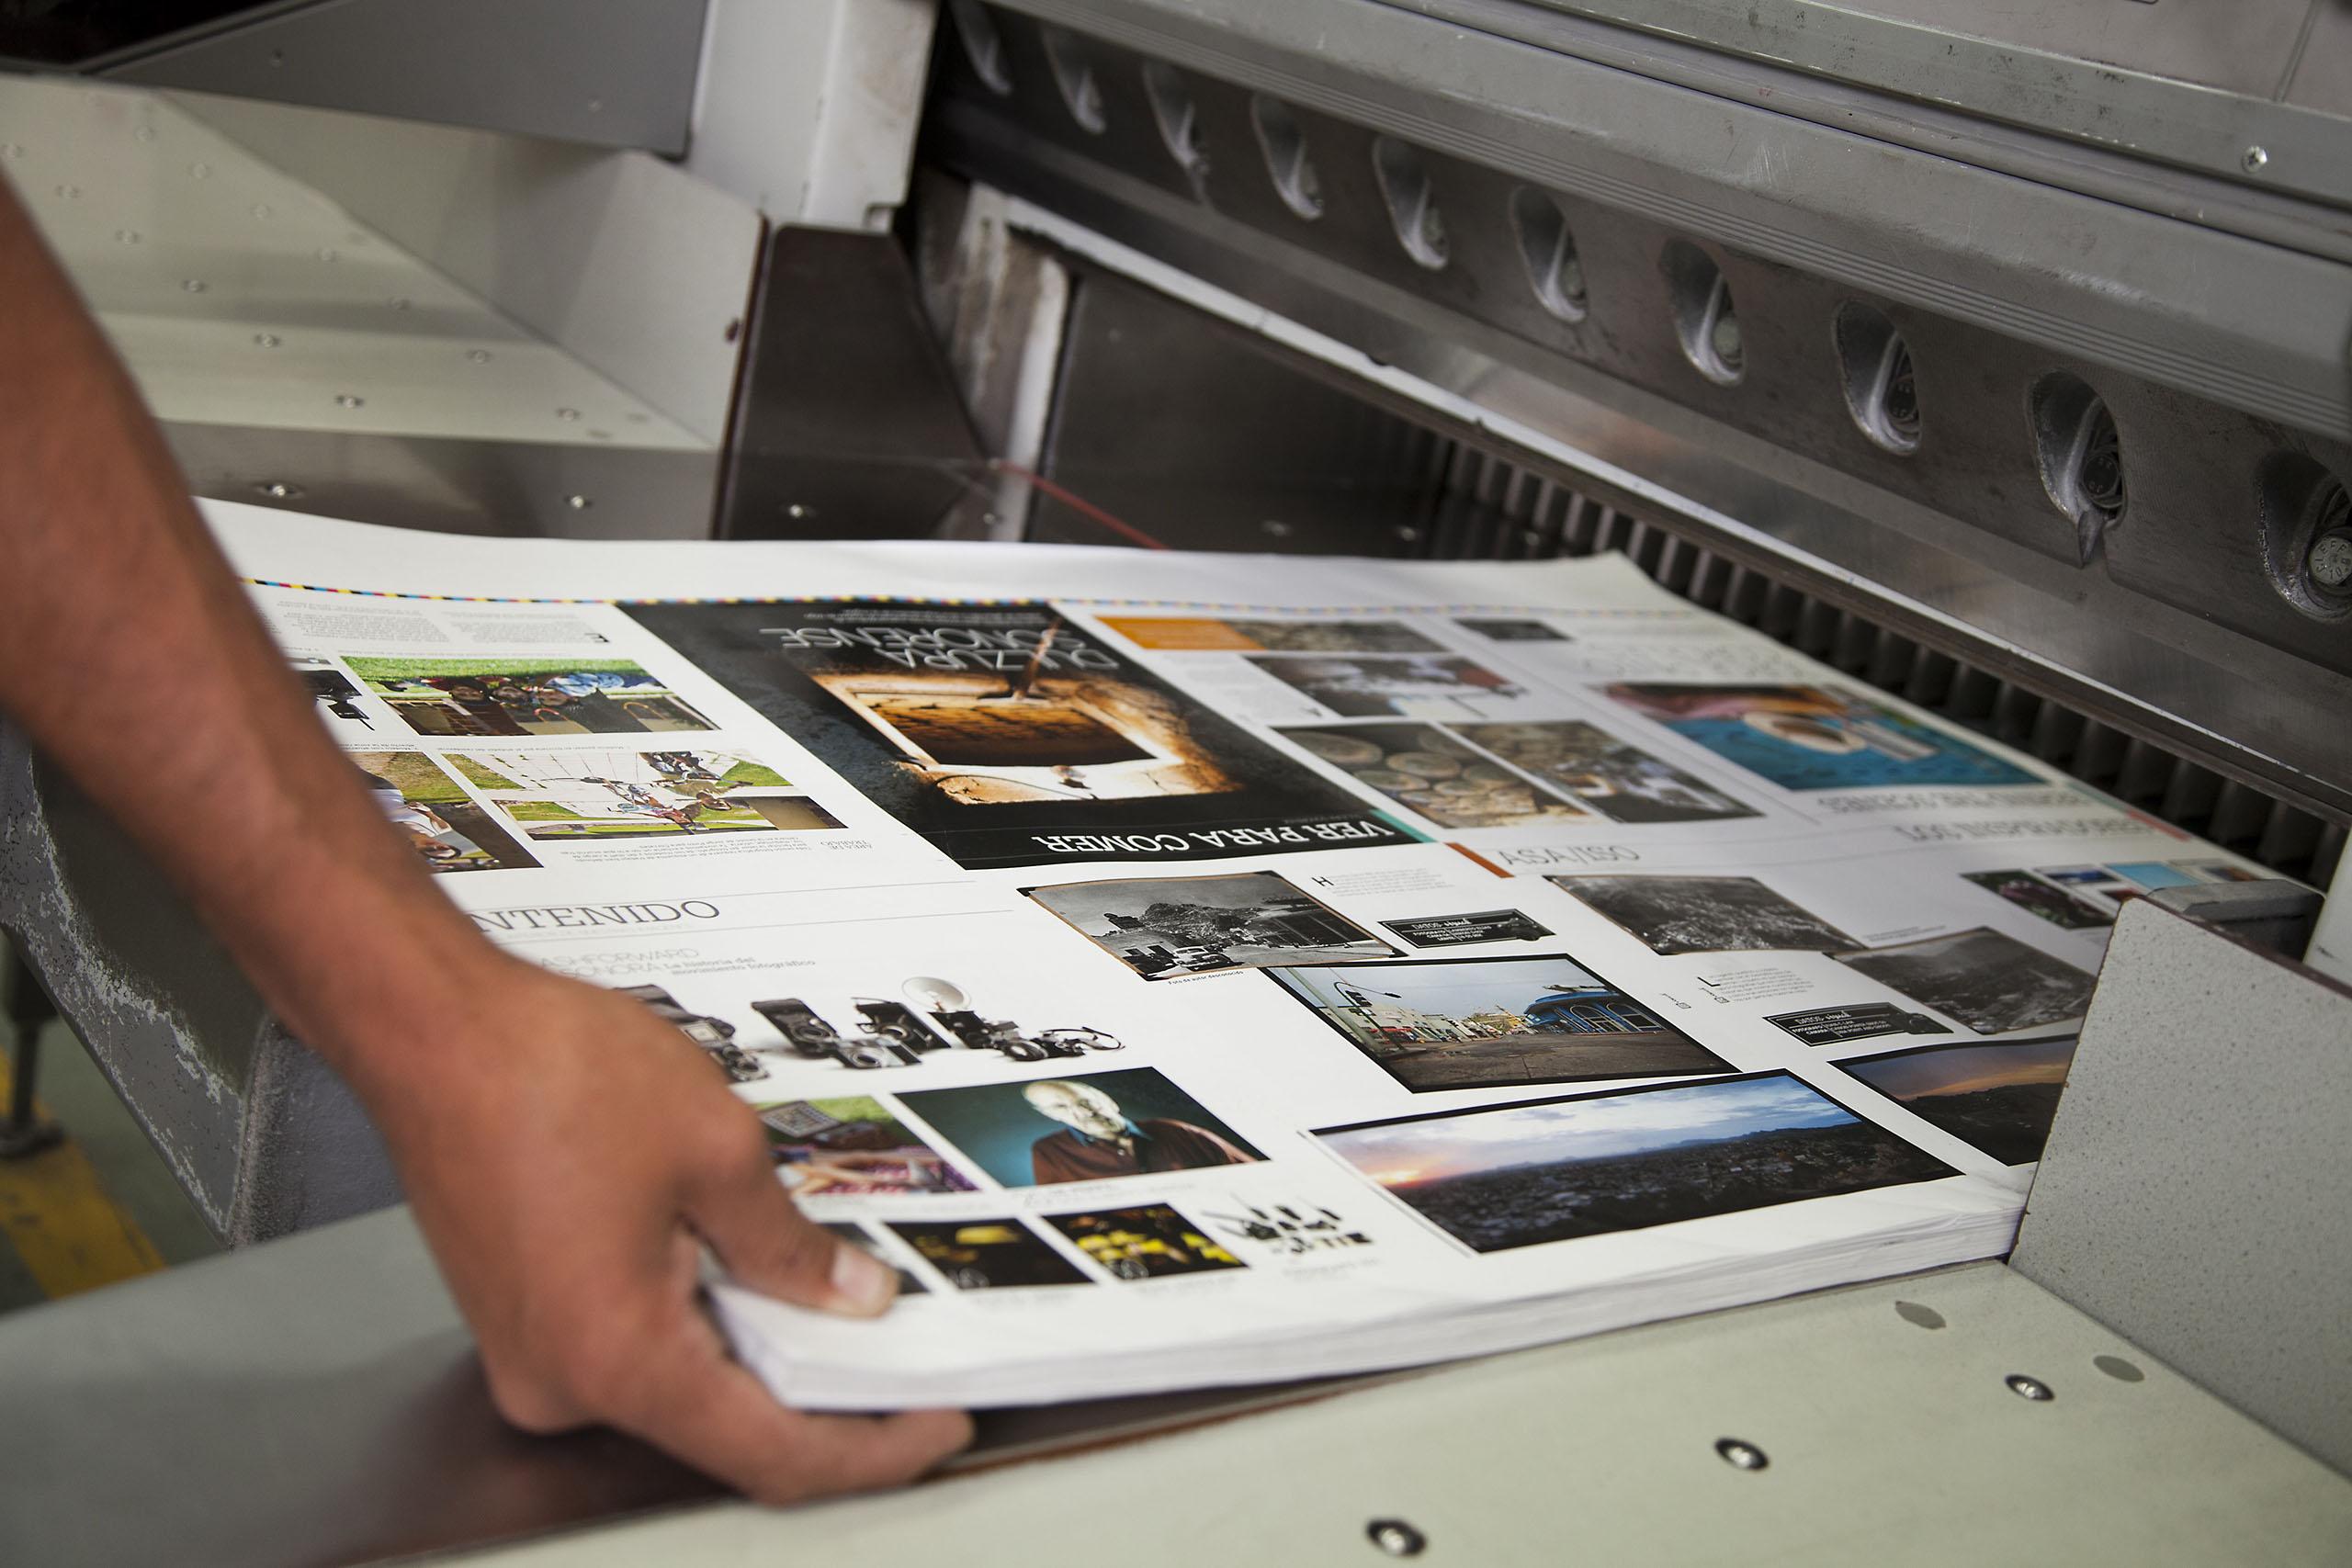 Printing processes